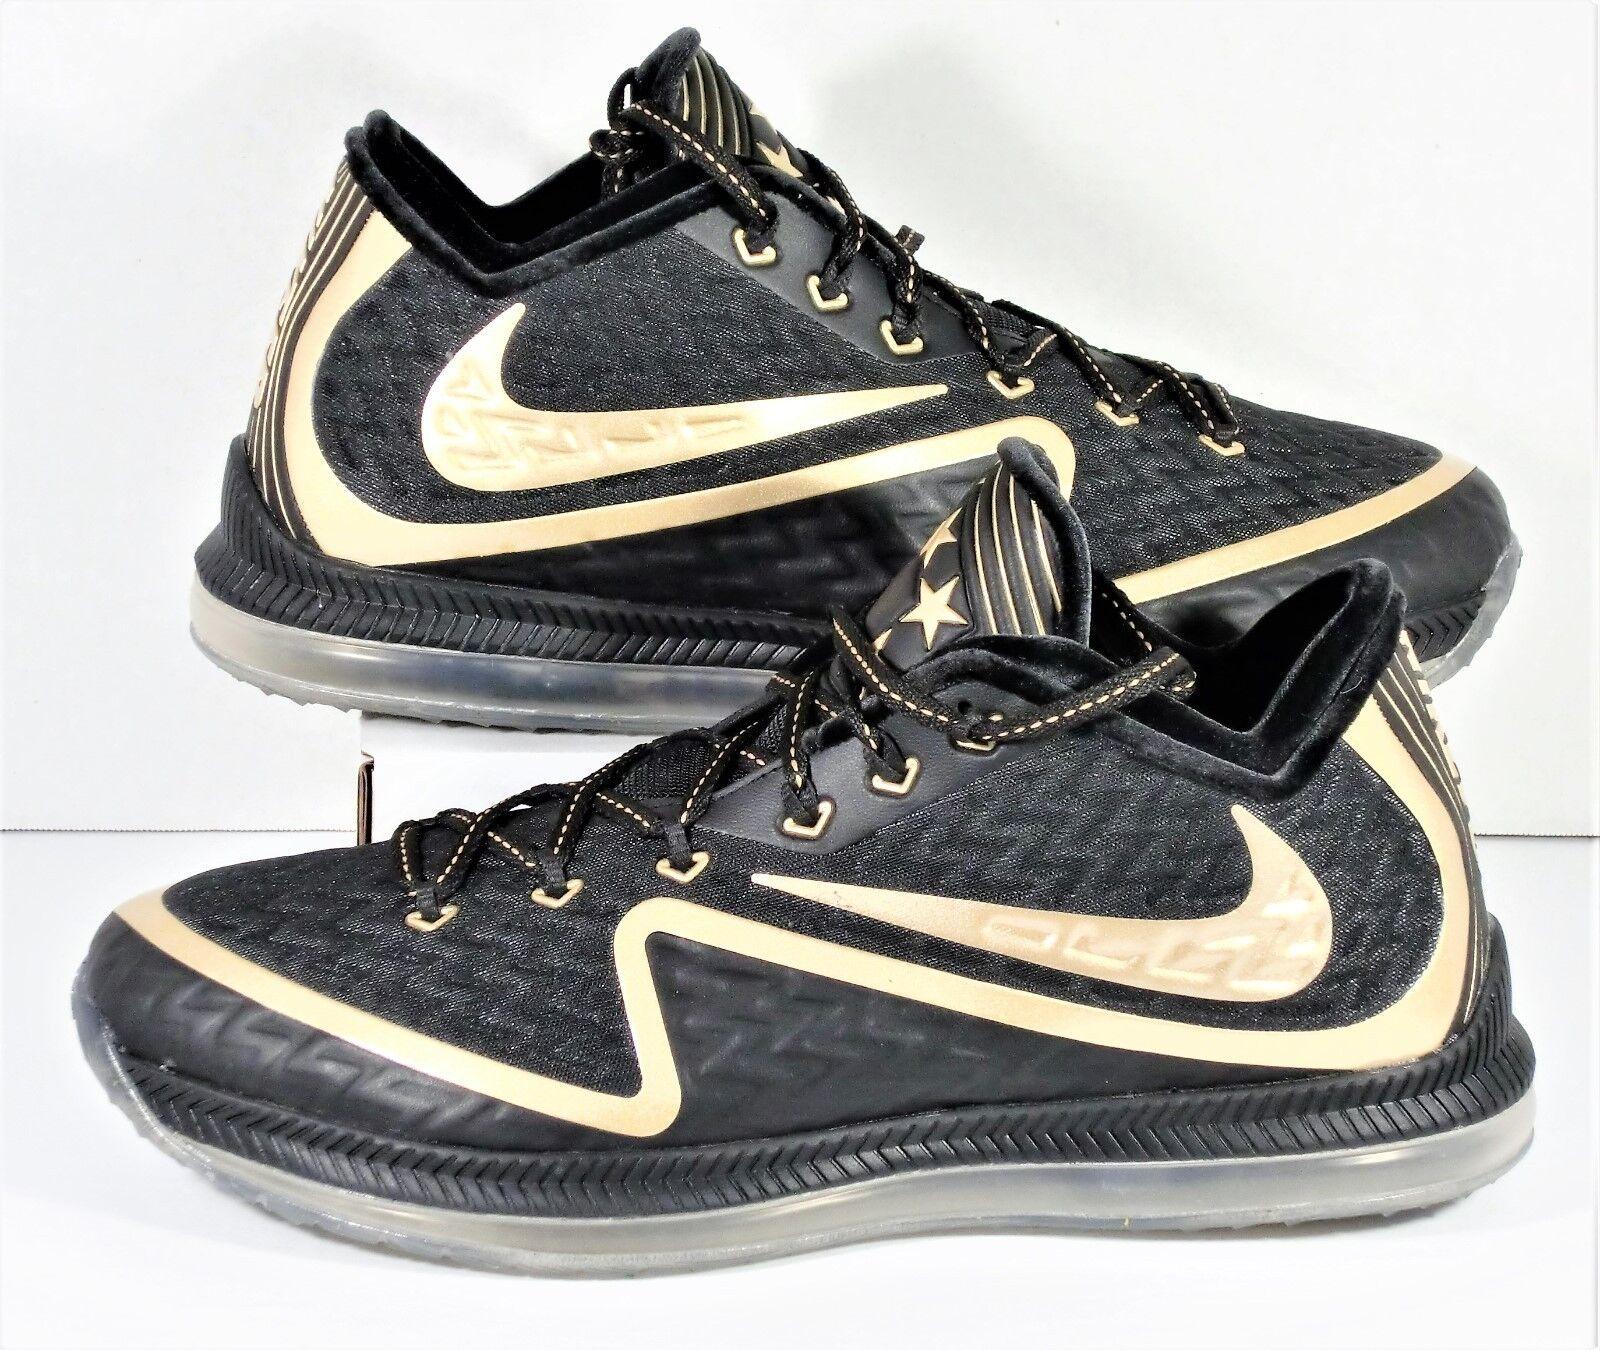 Nike Field General 2 Premium Training NFL Super Bowl 50 Black & Gold Shoe Sz 10